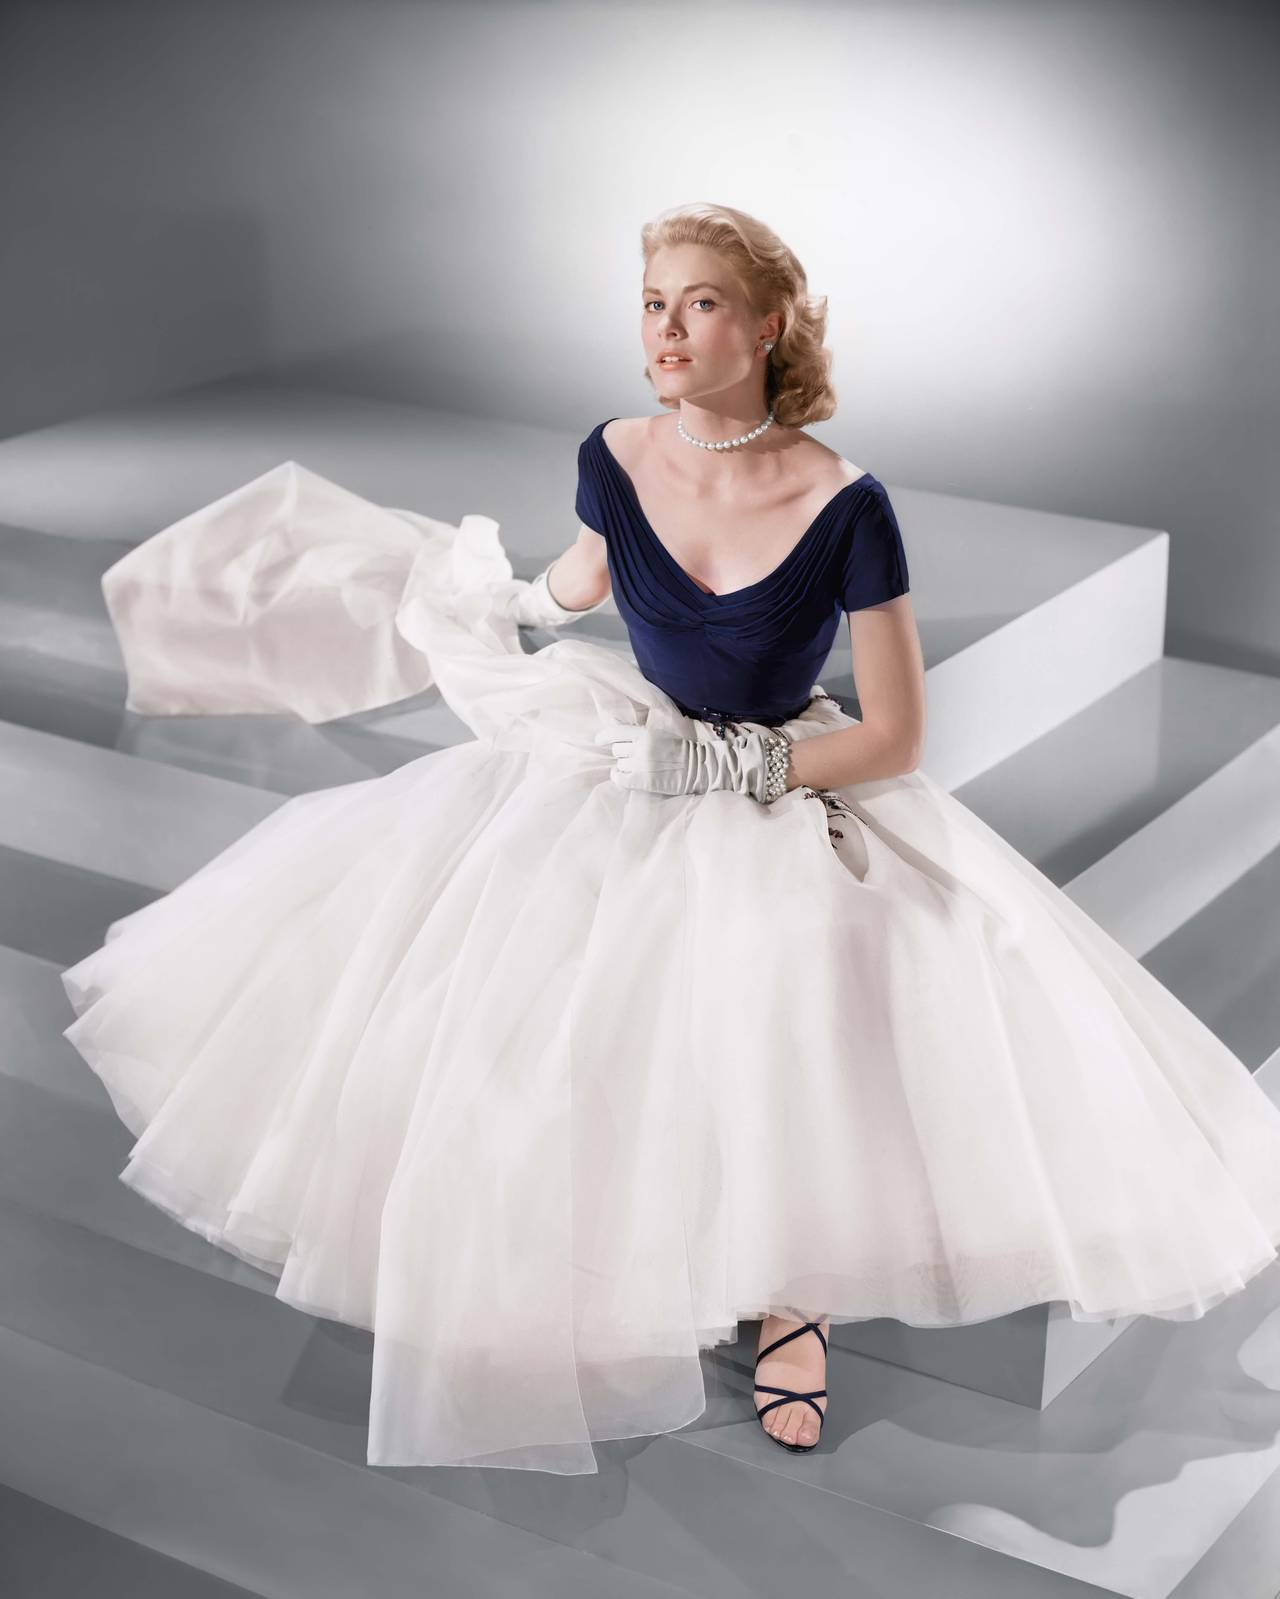 Grace Kelly đầm cổ xẻ váy phồng